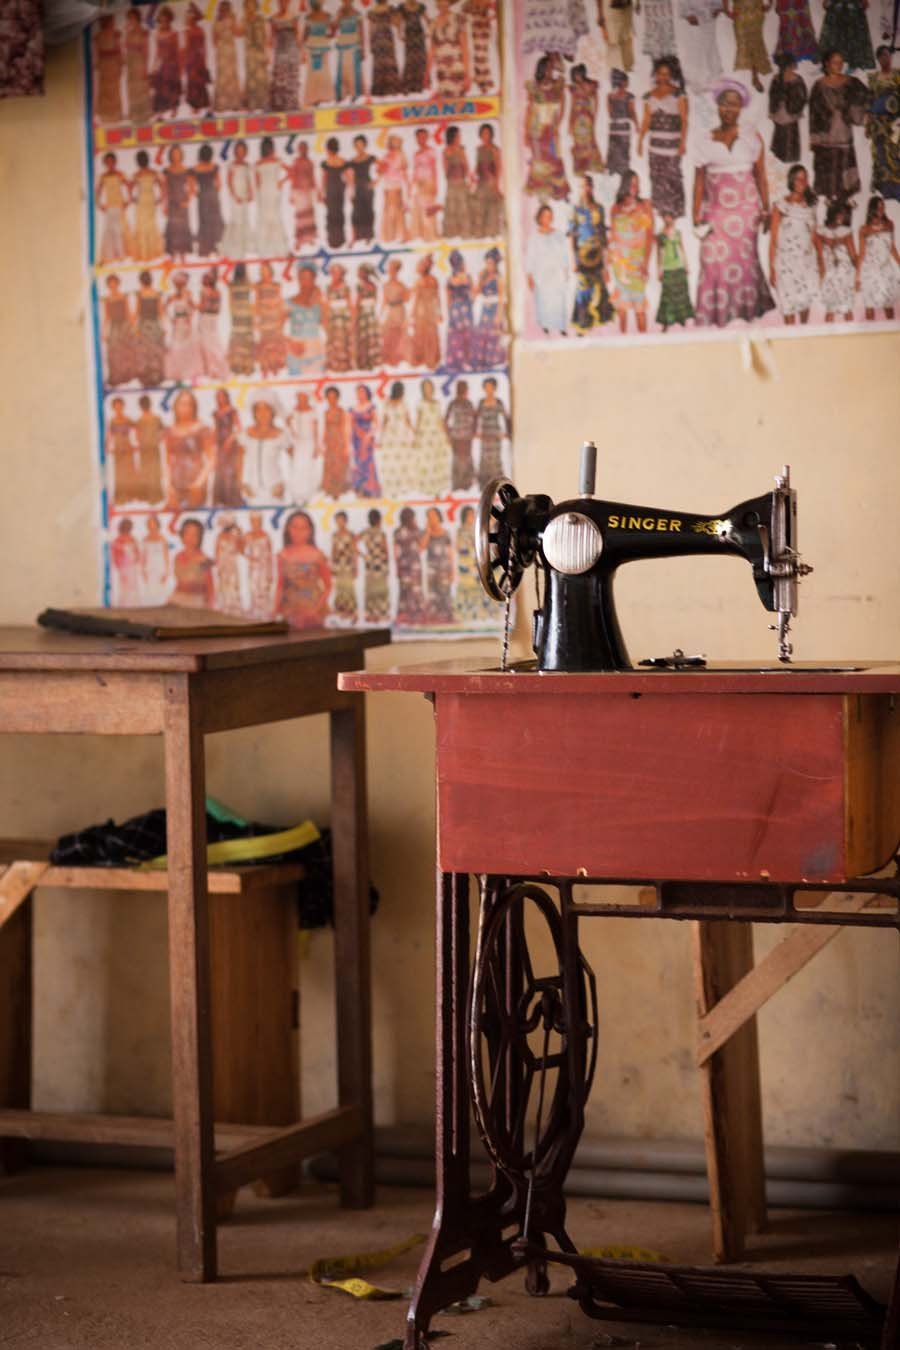 jessicadavisphotography.com | Jessica Davis Photography | Portrait Work in Uganda| Travel Photographer | World Event Photographs 1 (3).jpg